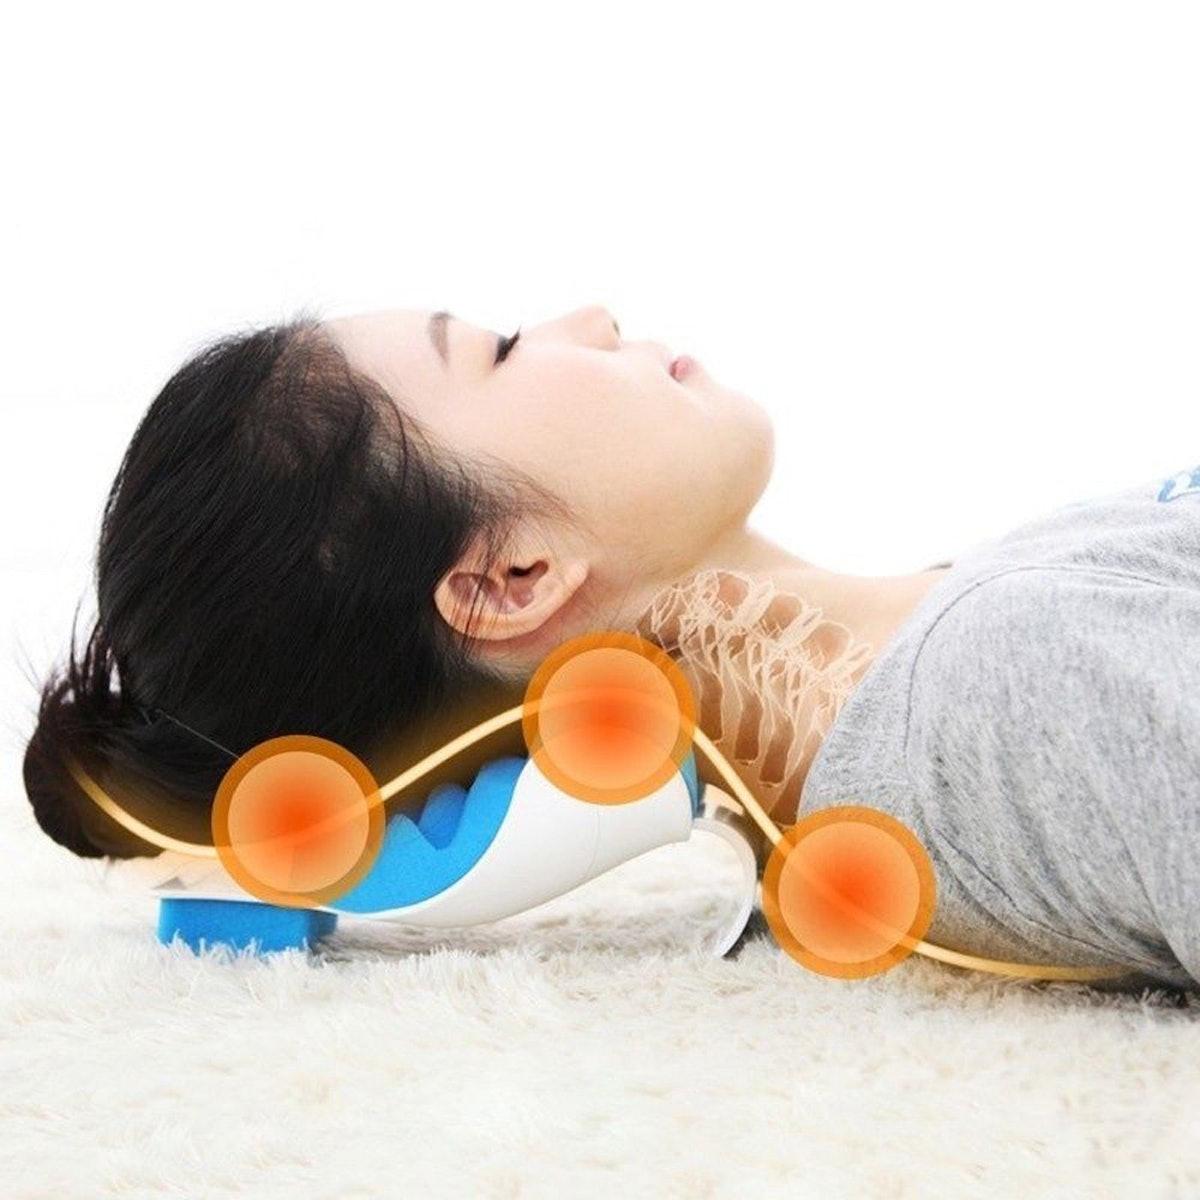 EcoGreen Storage Chiropractic Pillow